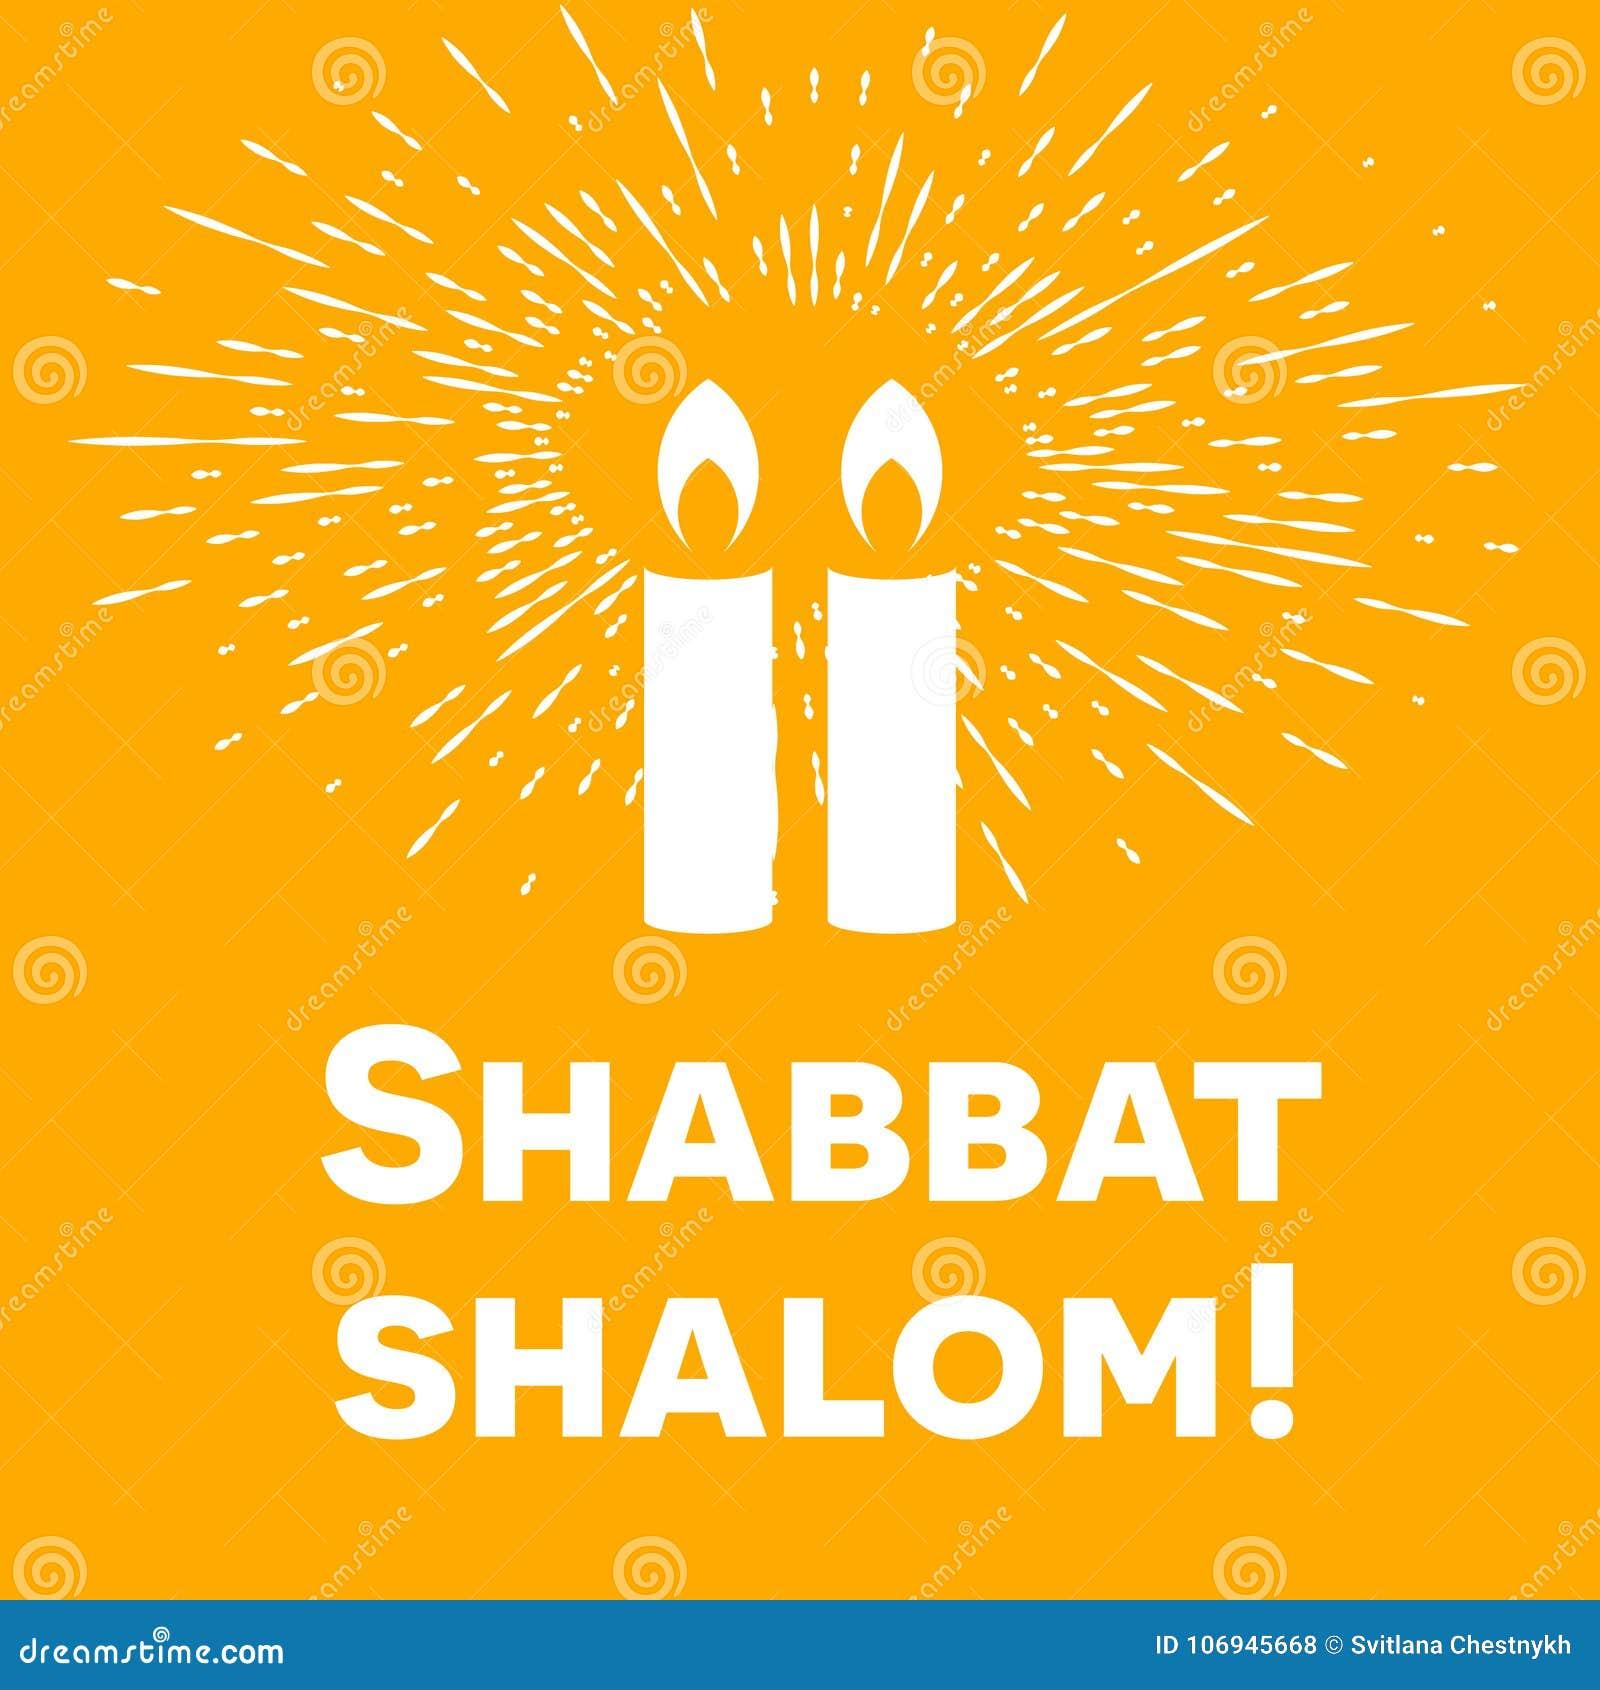 Shabbat shalom candles greeting card lettering retro rays of light shabbat shalom candles greeting card lettering retro rays of light m4hsunfo